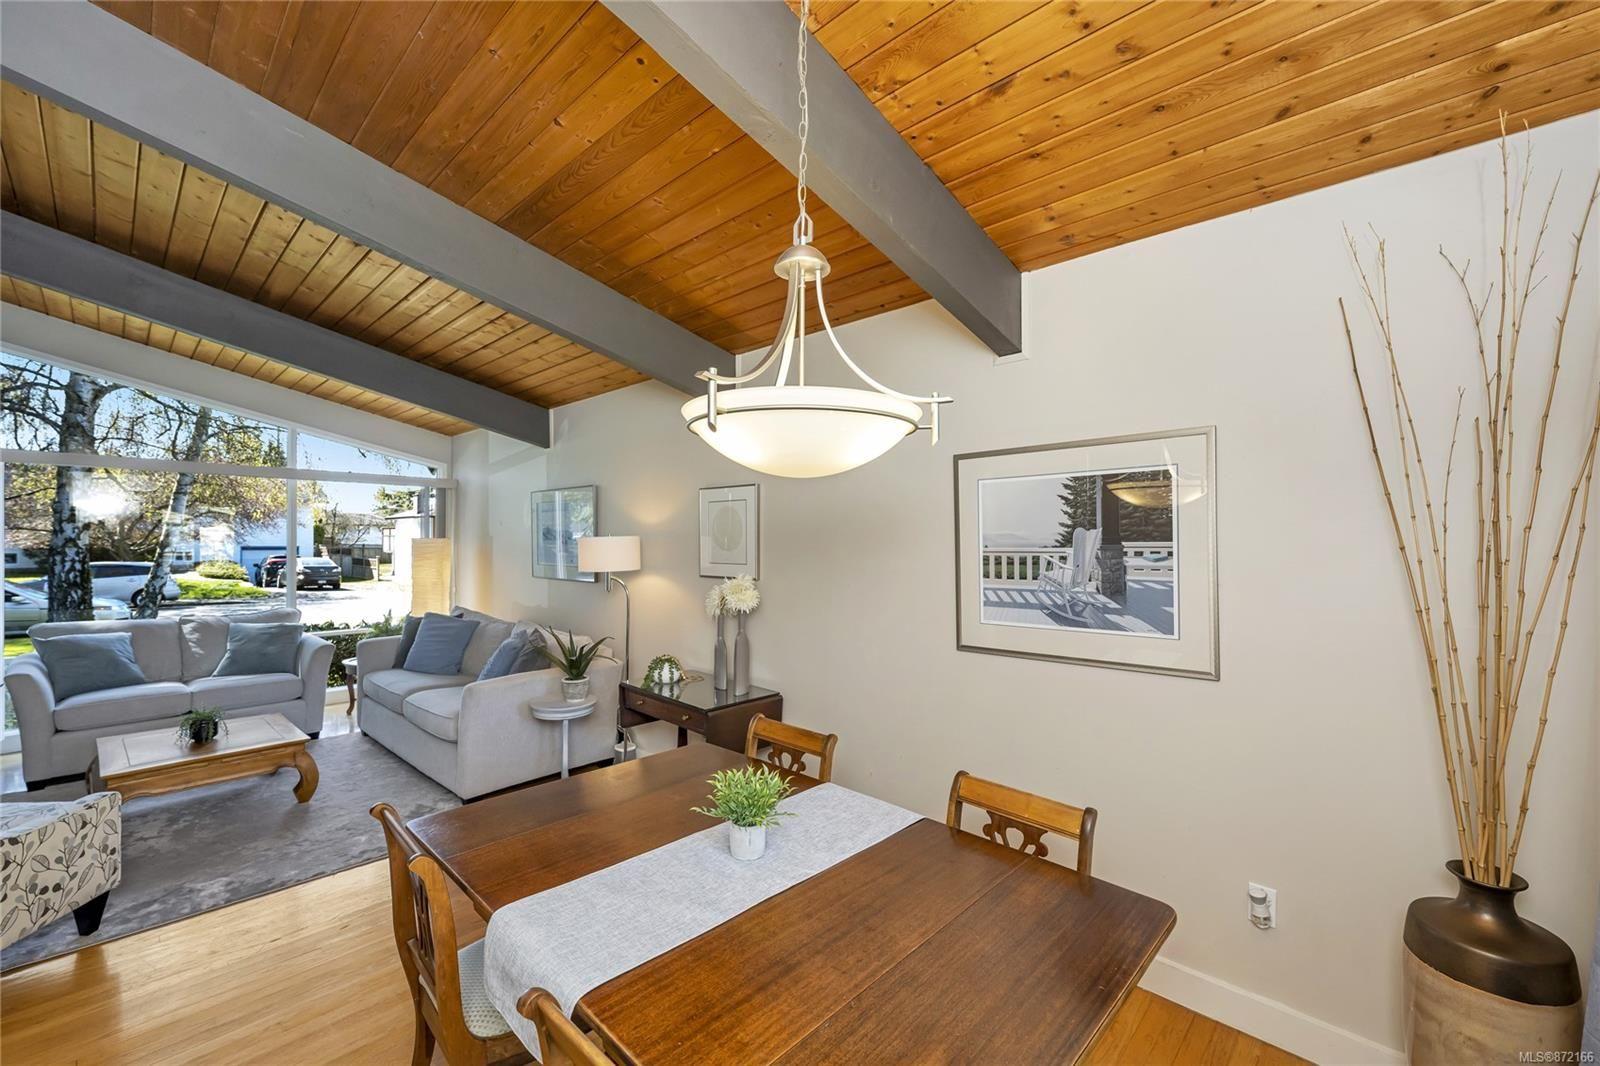 Photo 10: Photos: 1690 Blair Ave in : SE Lambrick Park House for sale (Saanich East)  : MLS®# 872166